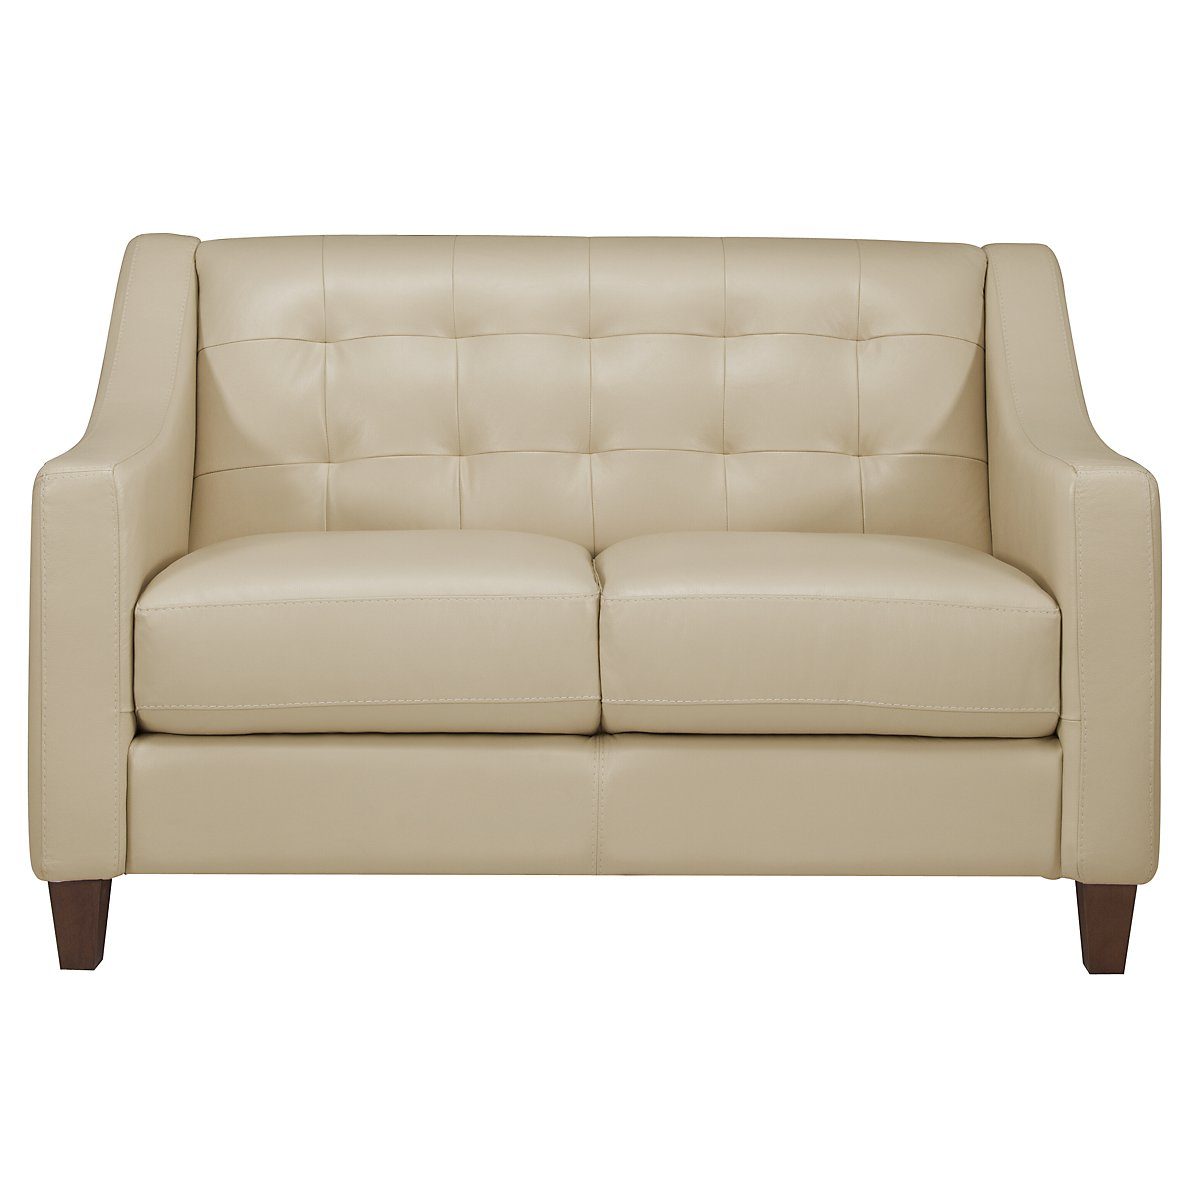 City Furniture Elise Sofa